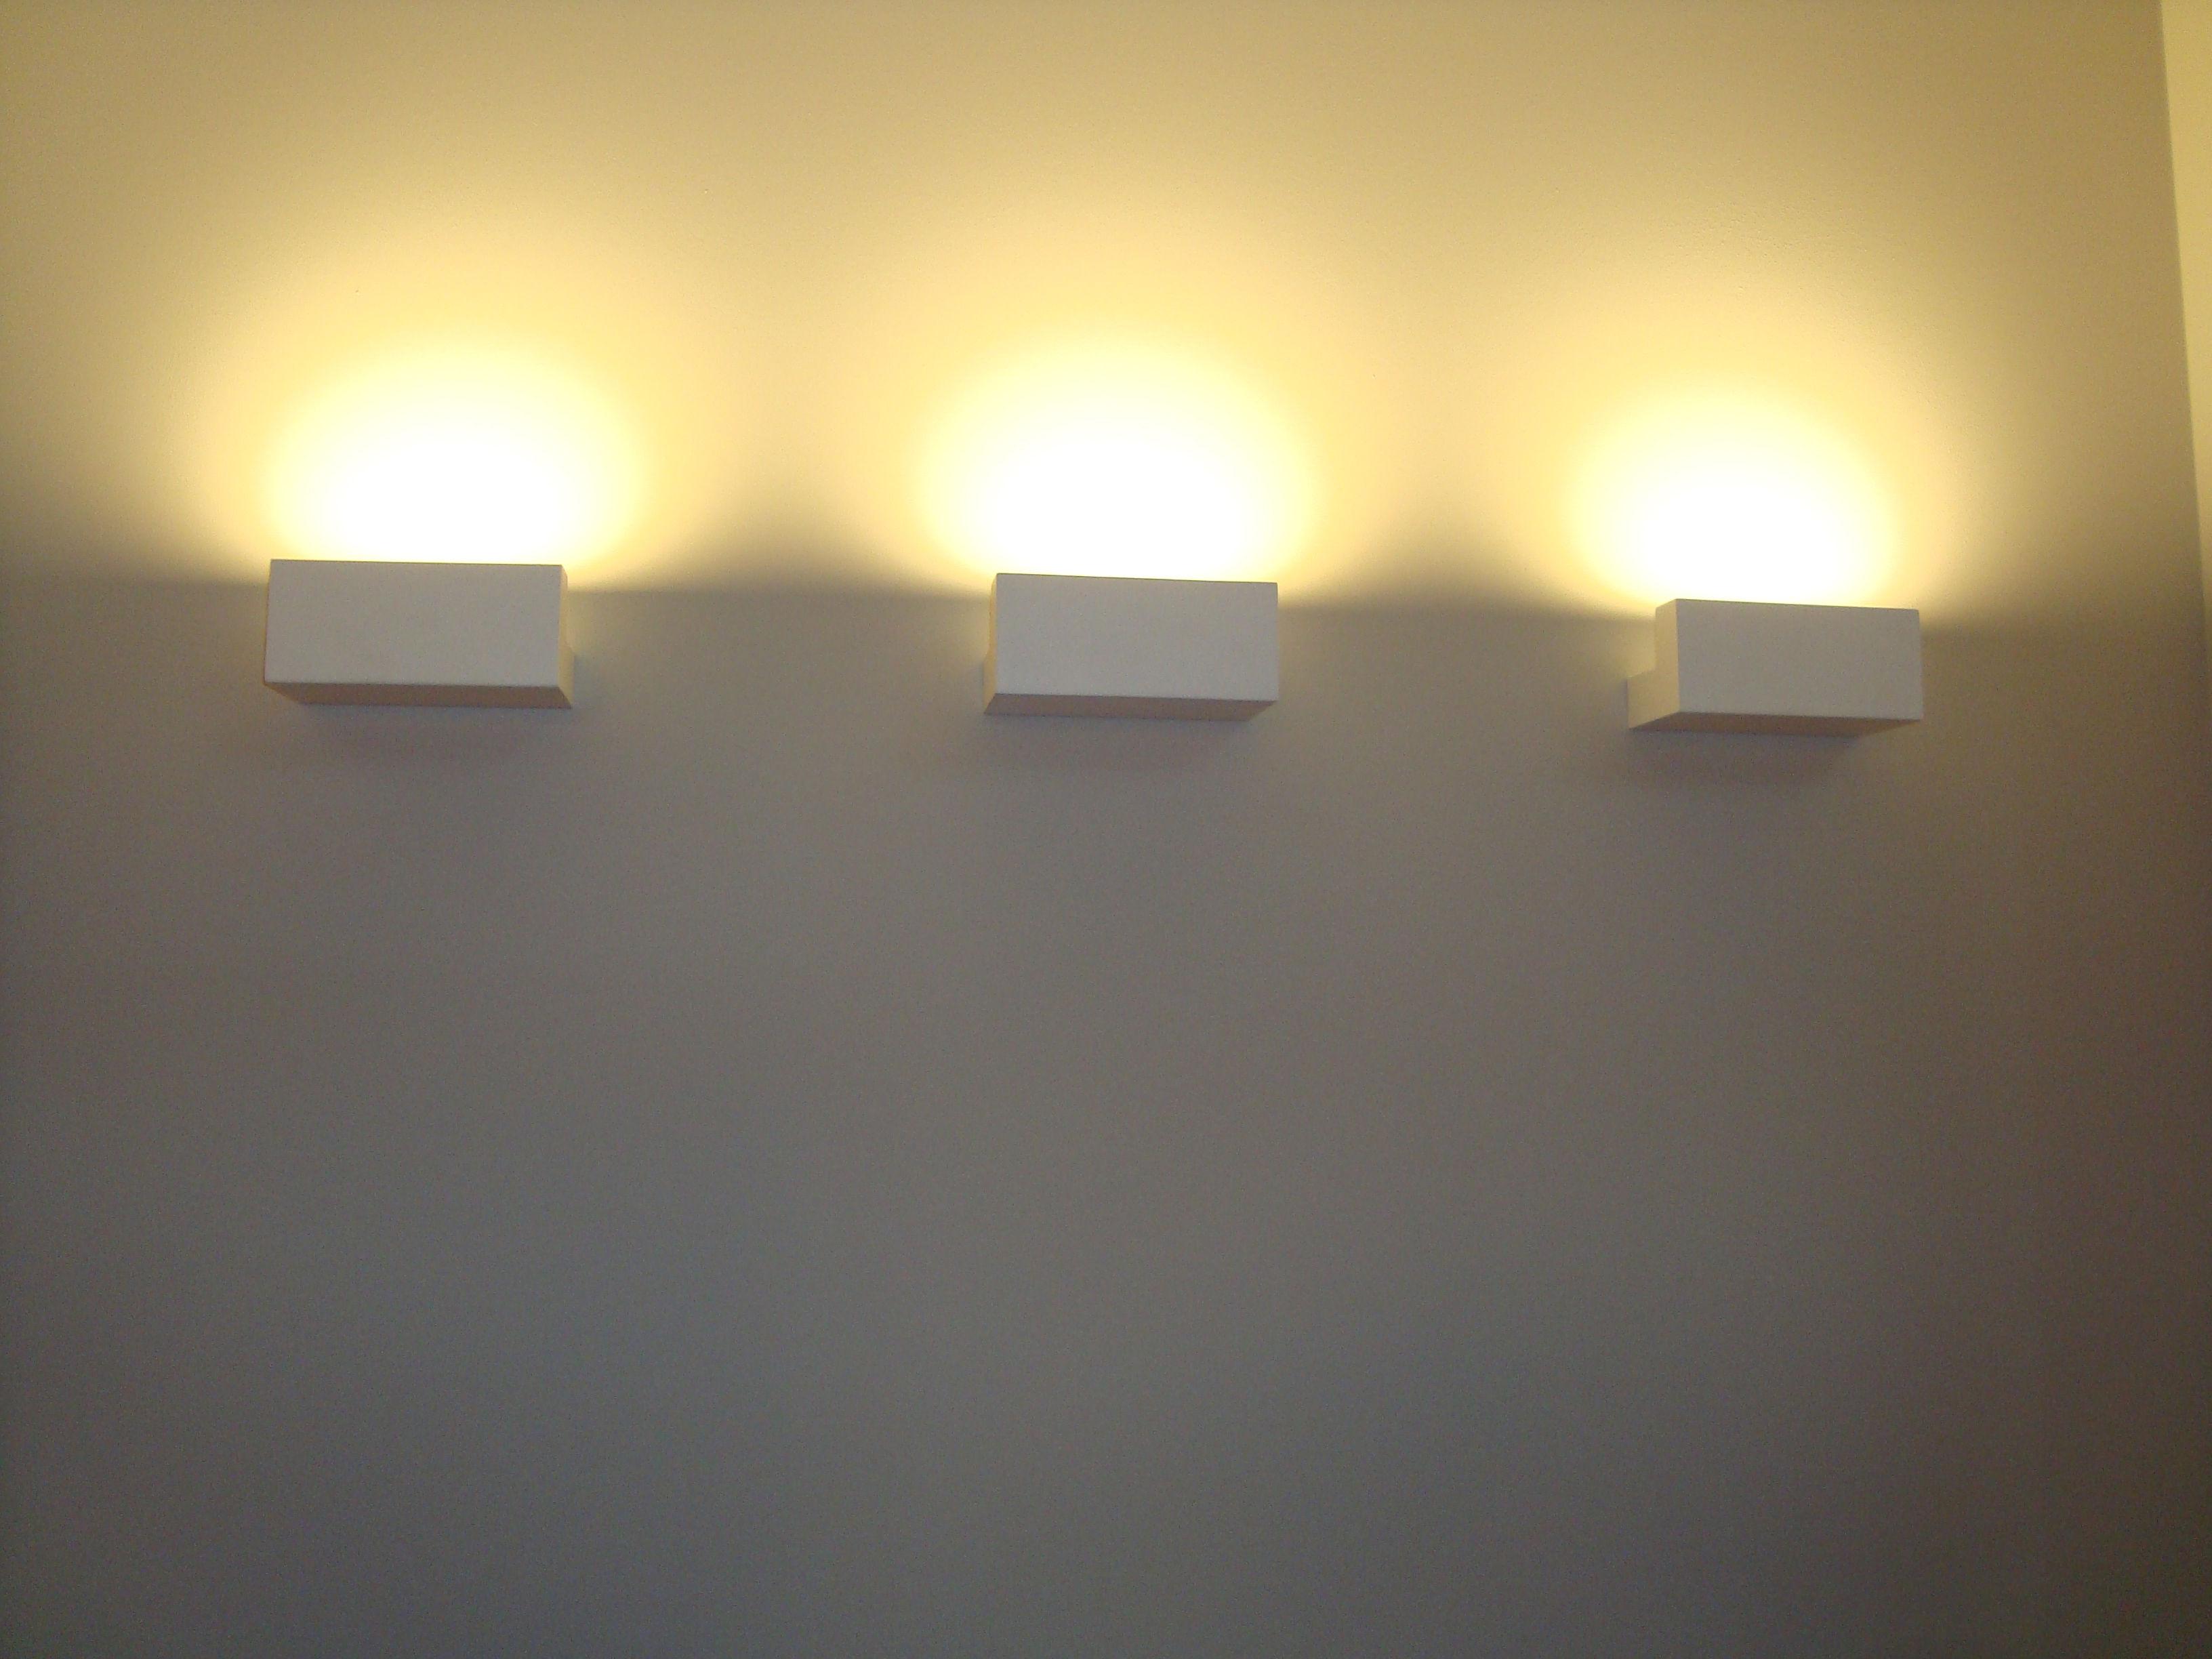 Wall Lights Long : Long light Wall light - LED Mat white by Flos